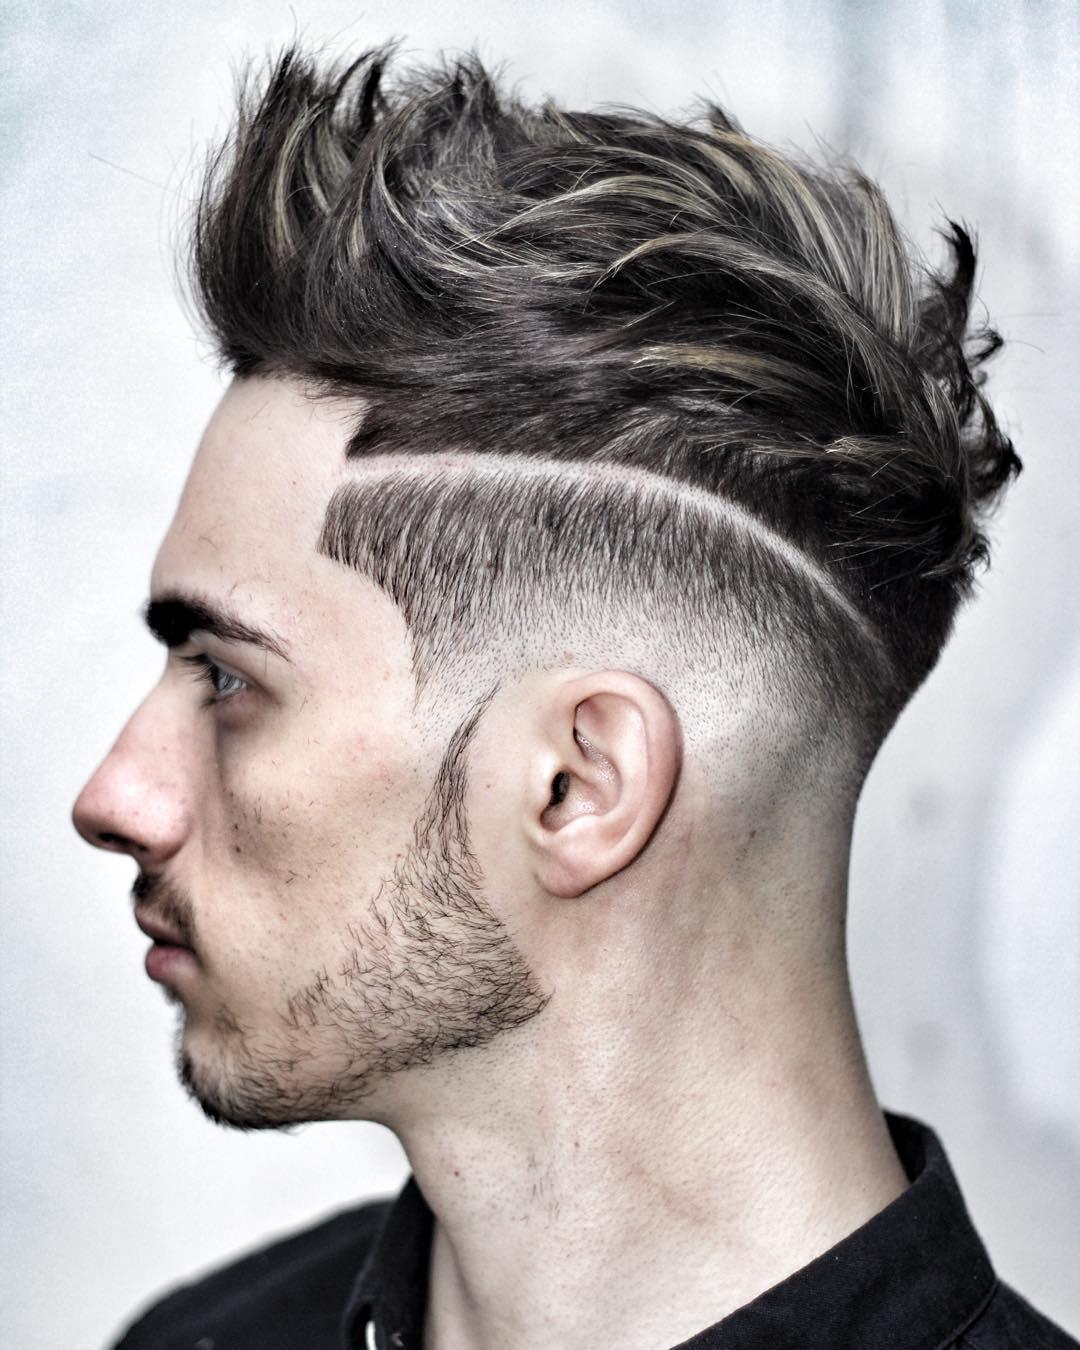 Stupendous Hairstyle Images Boy 2016 Best Hairstyles 2017 Short Hairstyles Gunalazisus